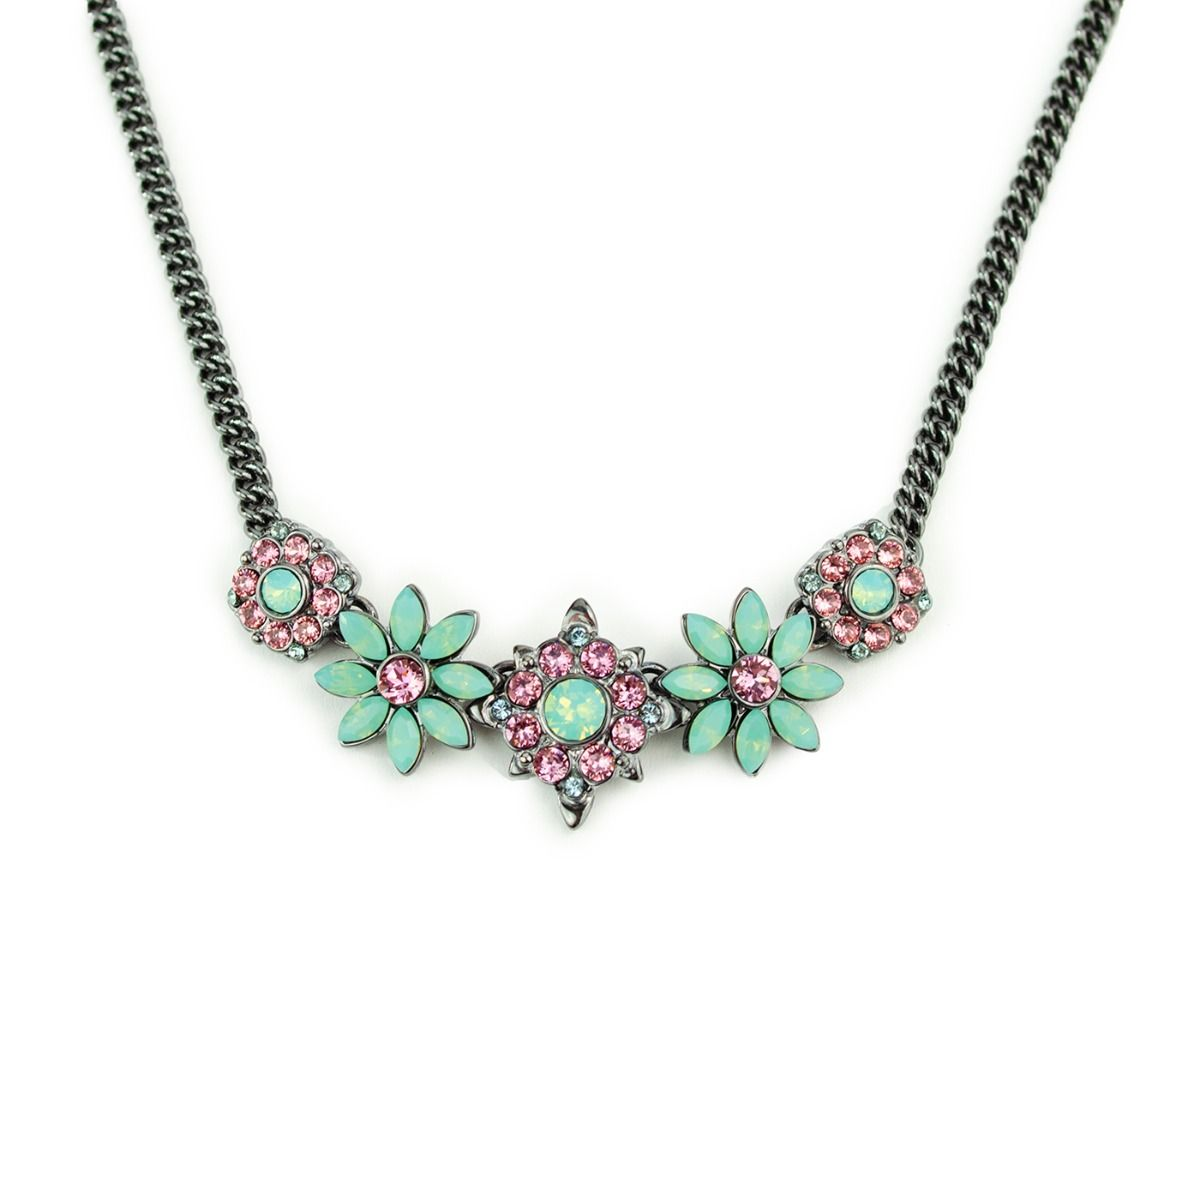 Fiorelli Fashion Gunmetal Plated Pink & Mint Crystal by Swarovski Flower Statement Necklace 45cm + 5cm